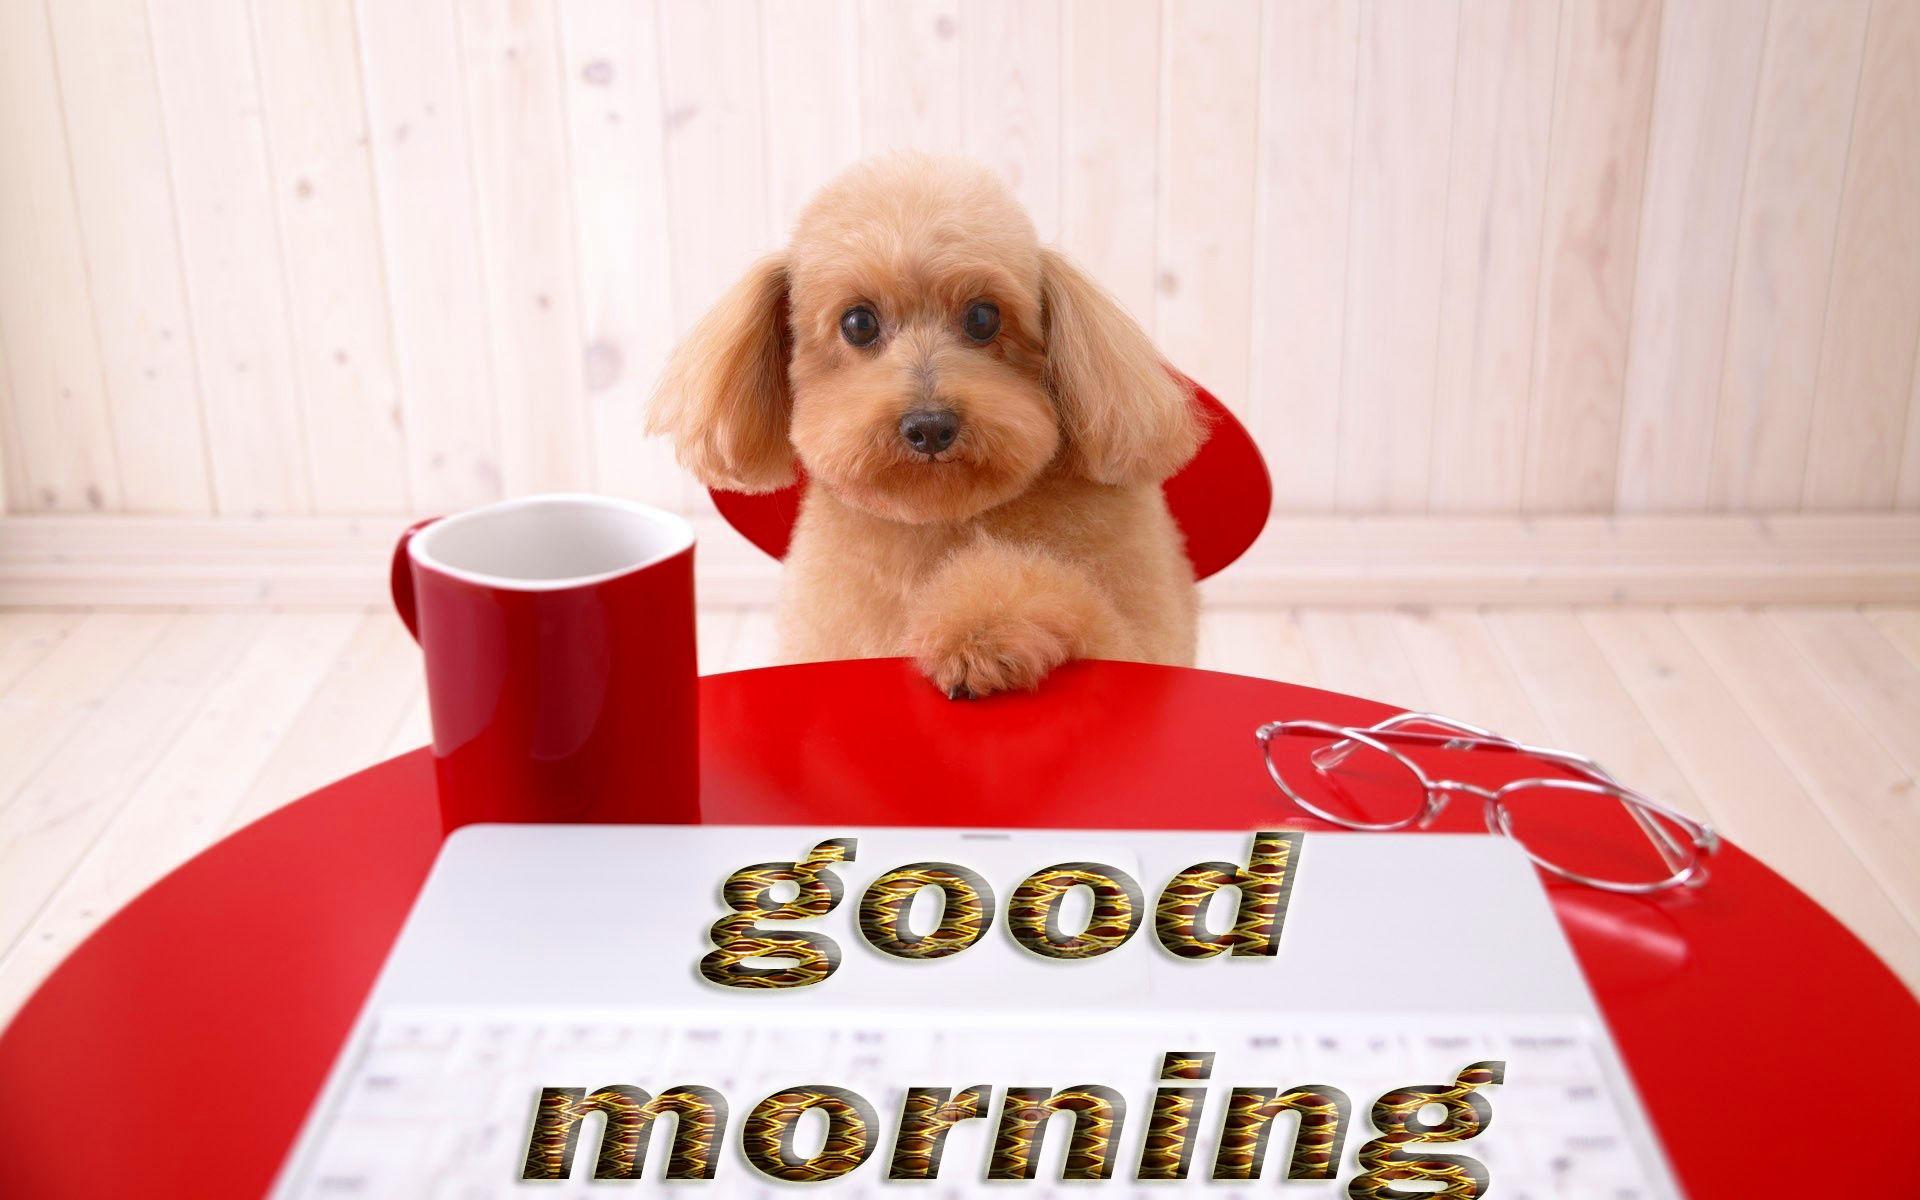 Good Morning Puppy